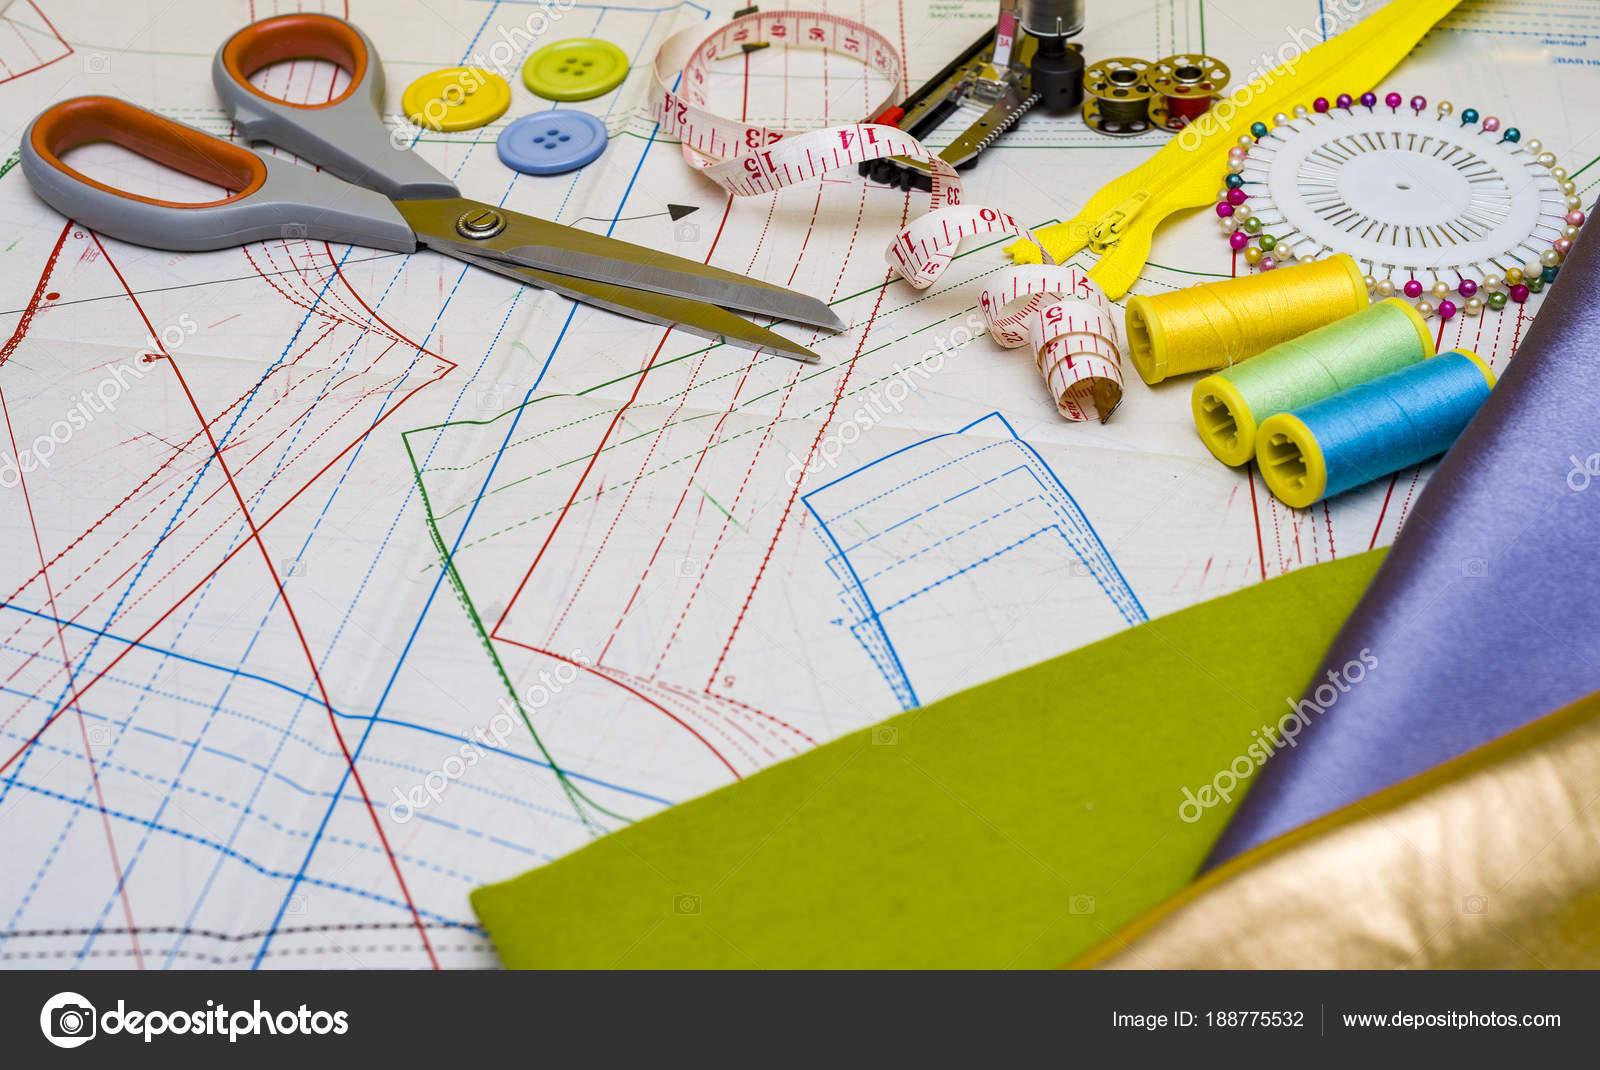 costura y patronaje — Foto de stock © zilber42.gmail.com #188775532